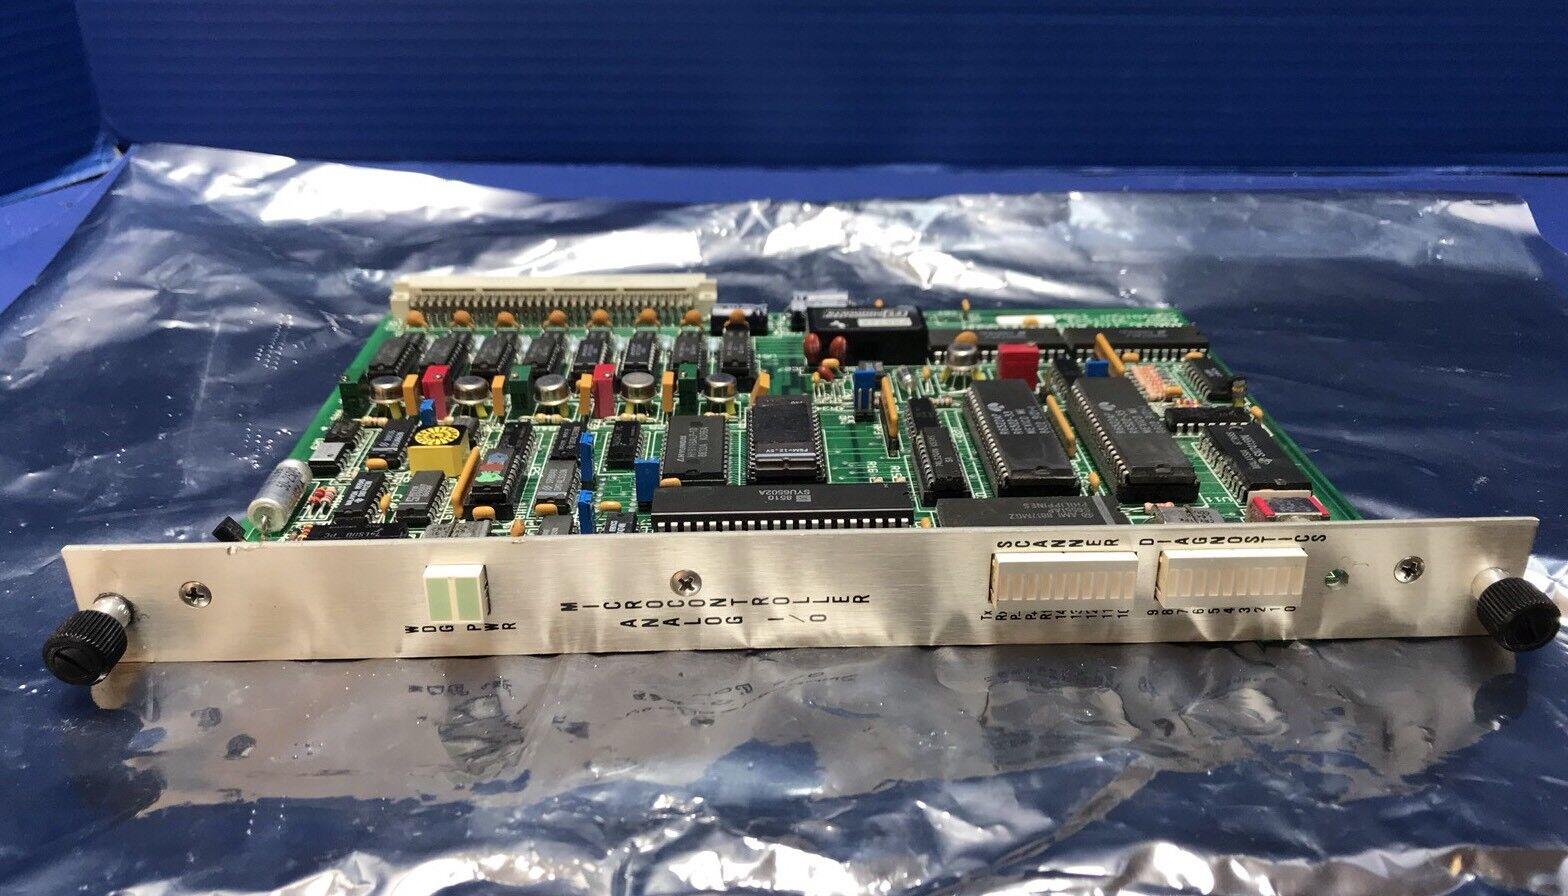 Bruce Analog I O Microcontroller Microprocessor PCB Module, 3161525 V15